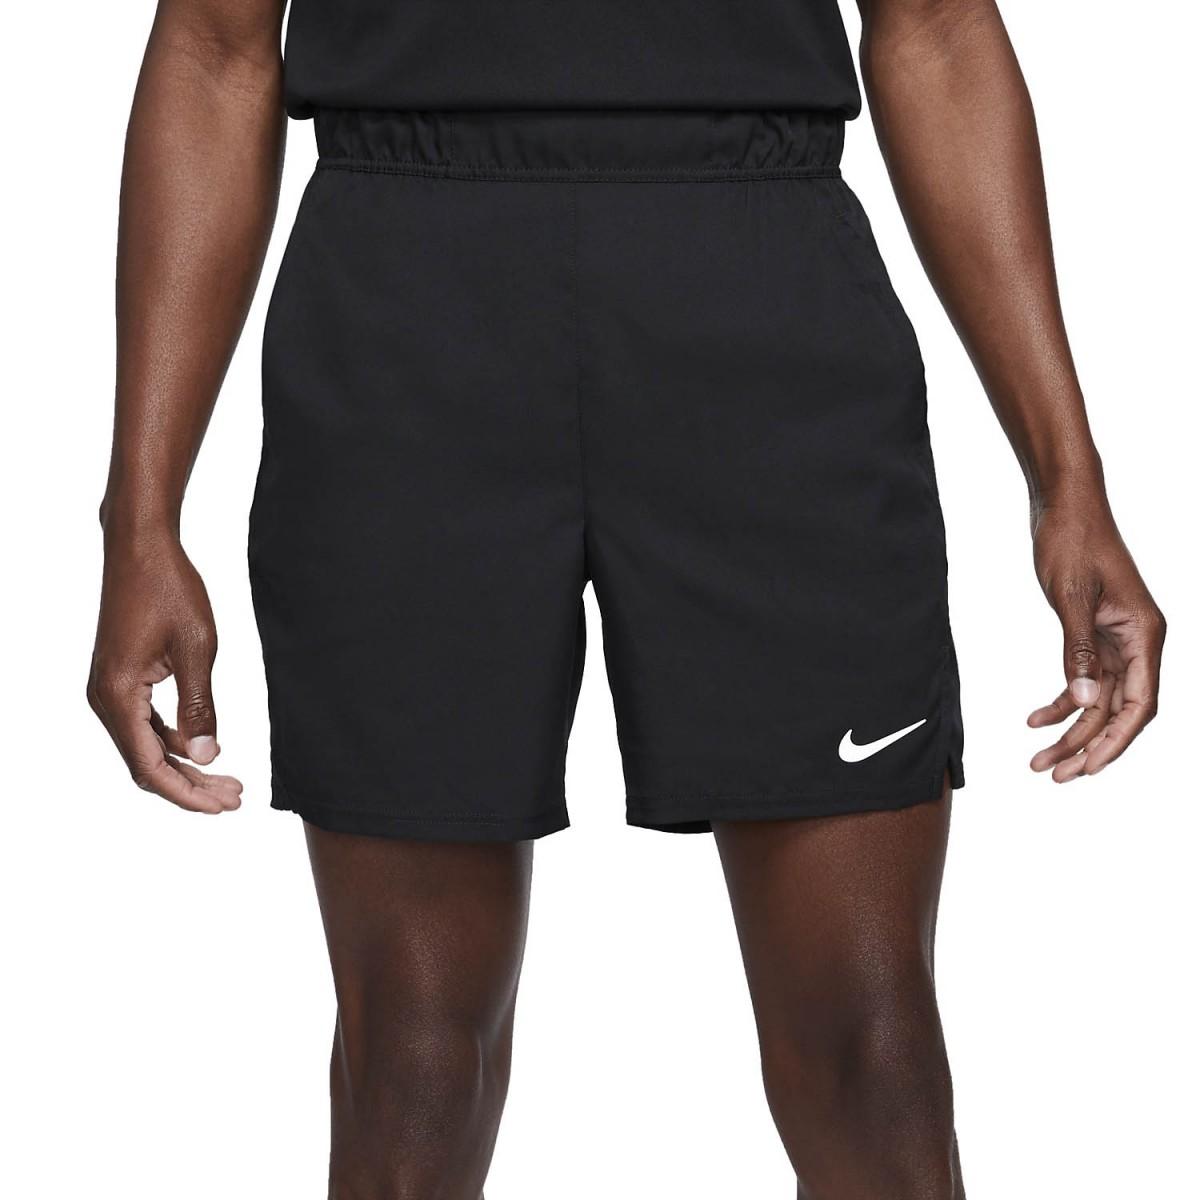 Теннисные шорты мужские Nike Court Flex Victory 7in Short black/white